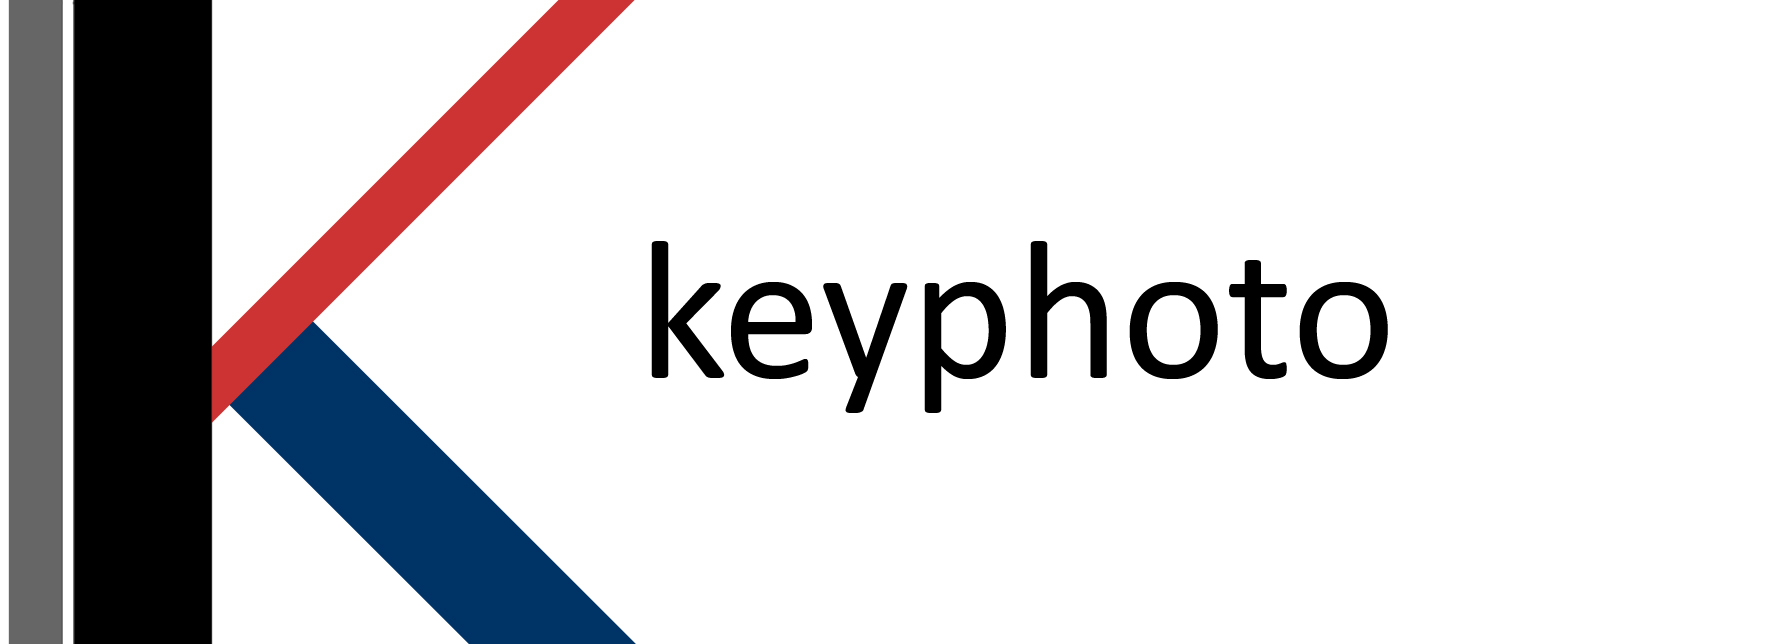 Keyphoto